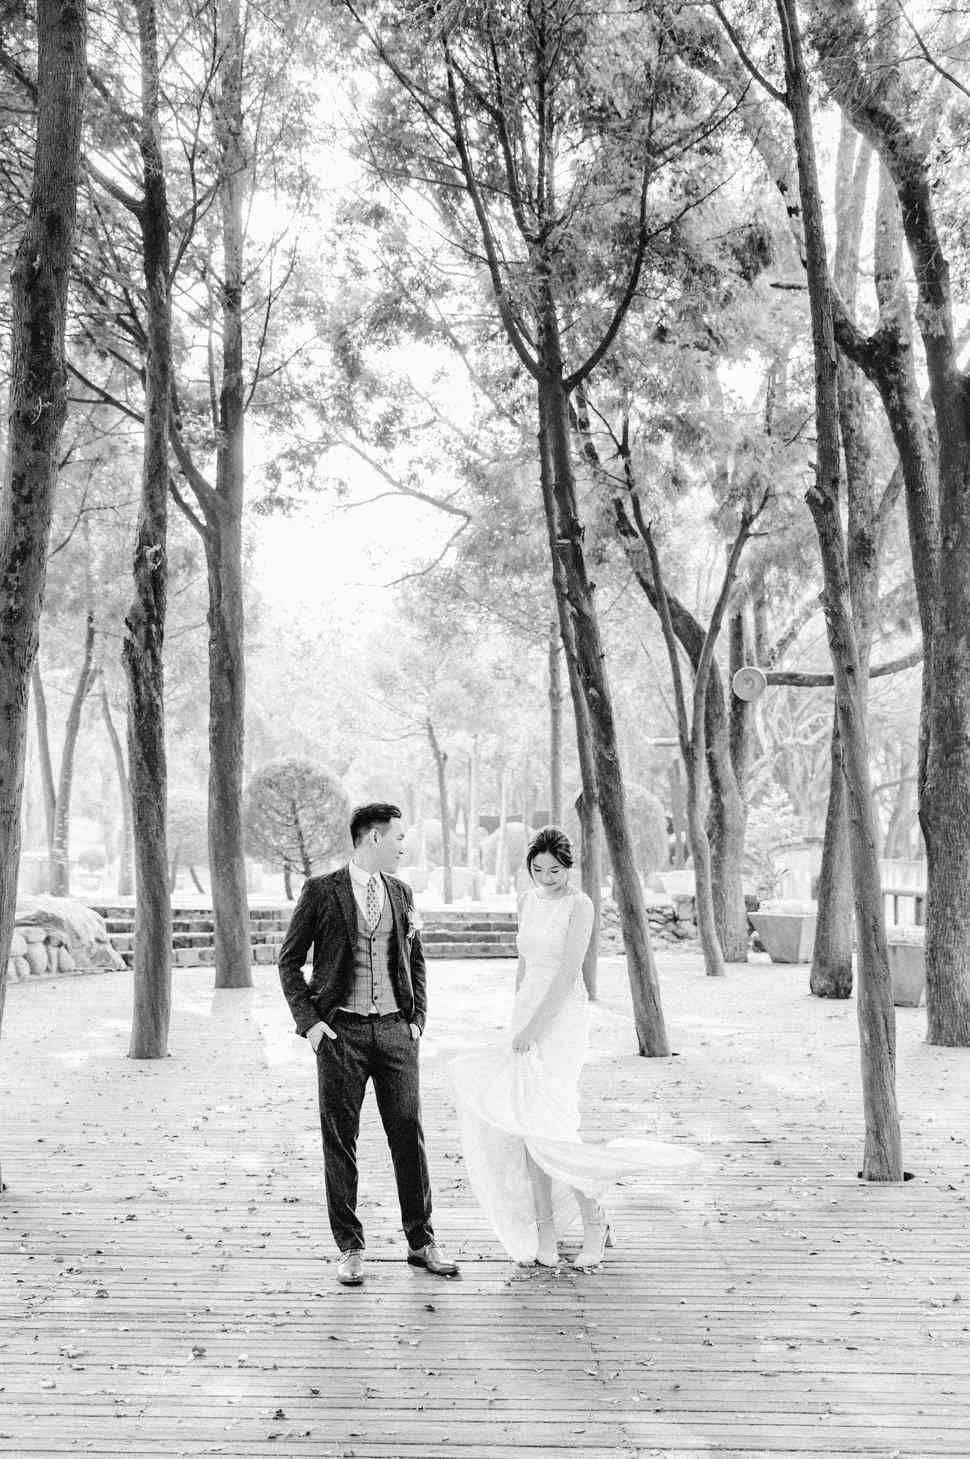 AG4_4479A-2 - Cradle Wedding搖籃手工婚紗《結婚吧》